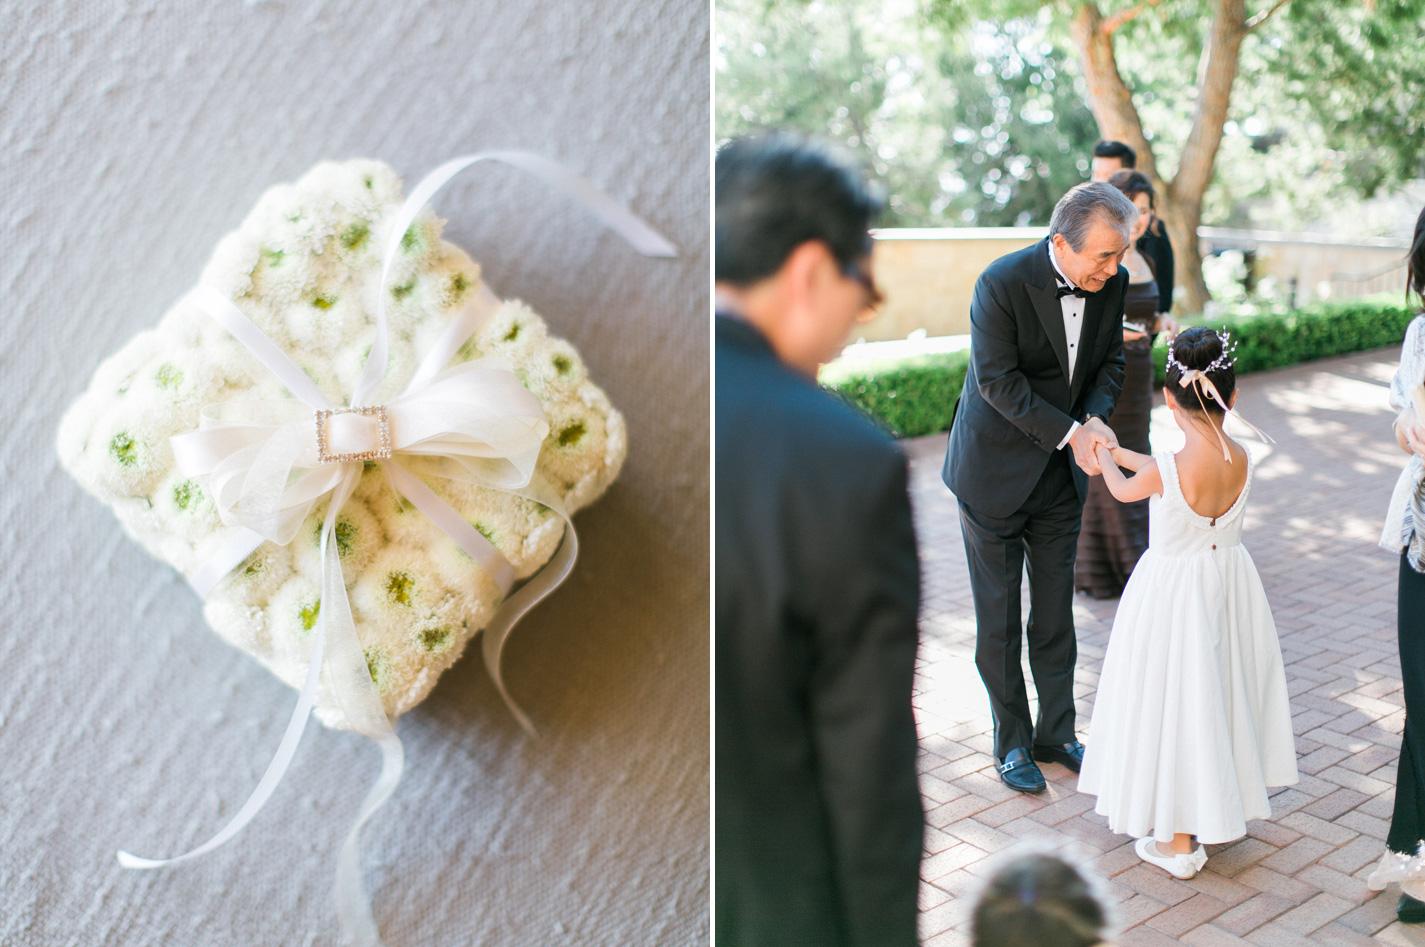 Pelican-hill-wedding-10